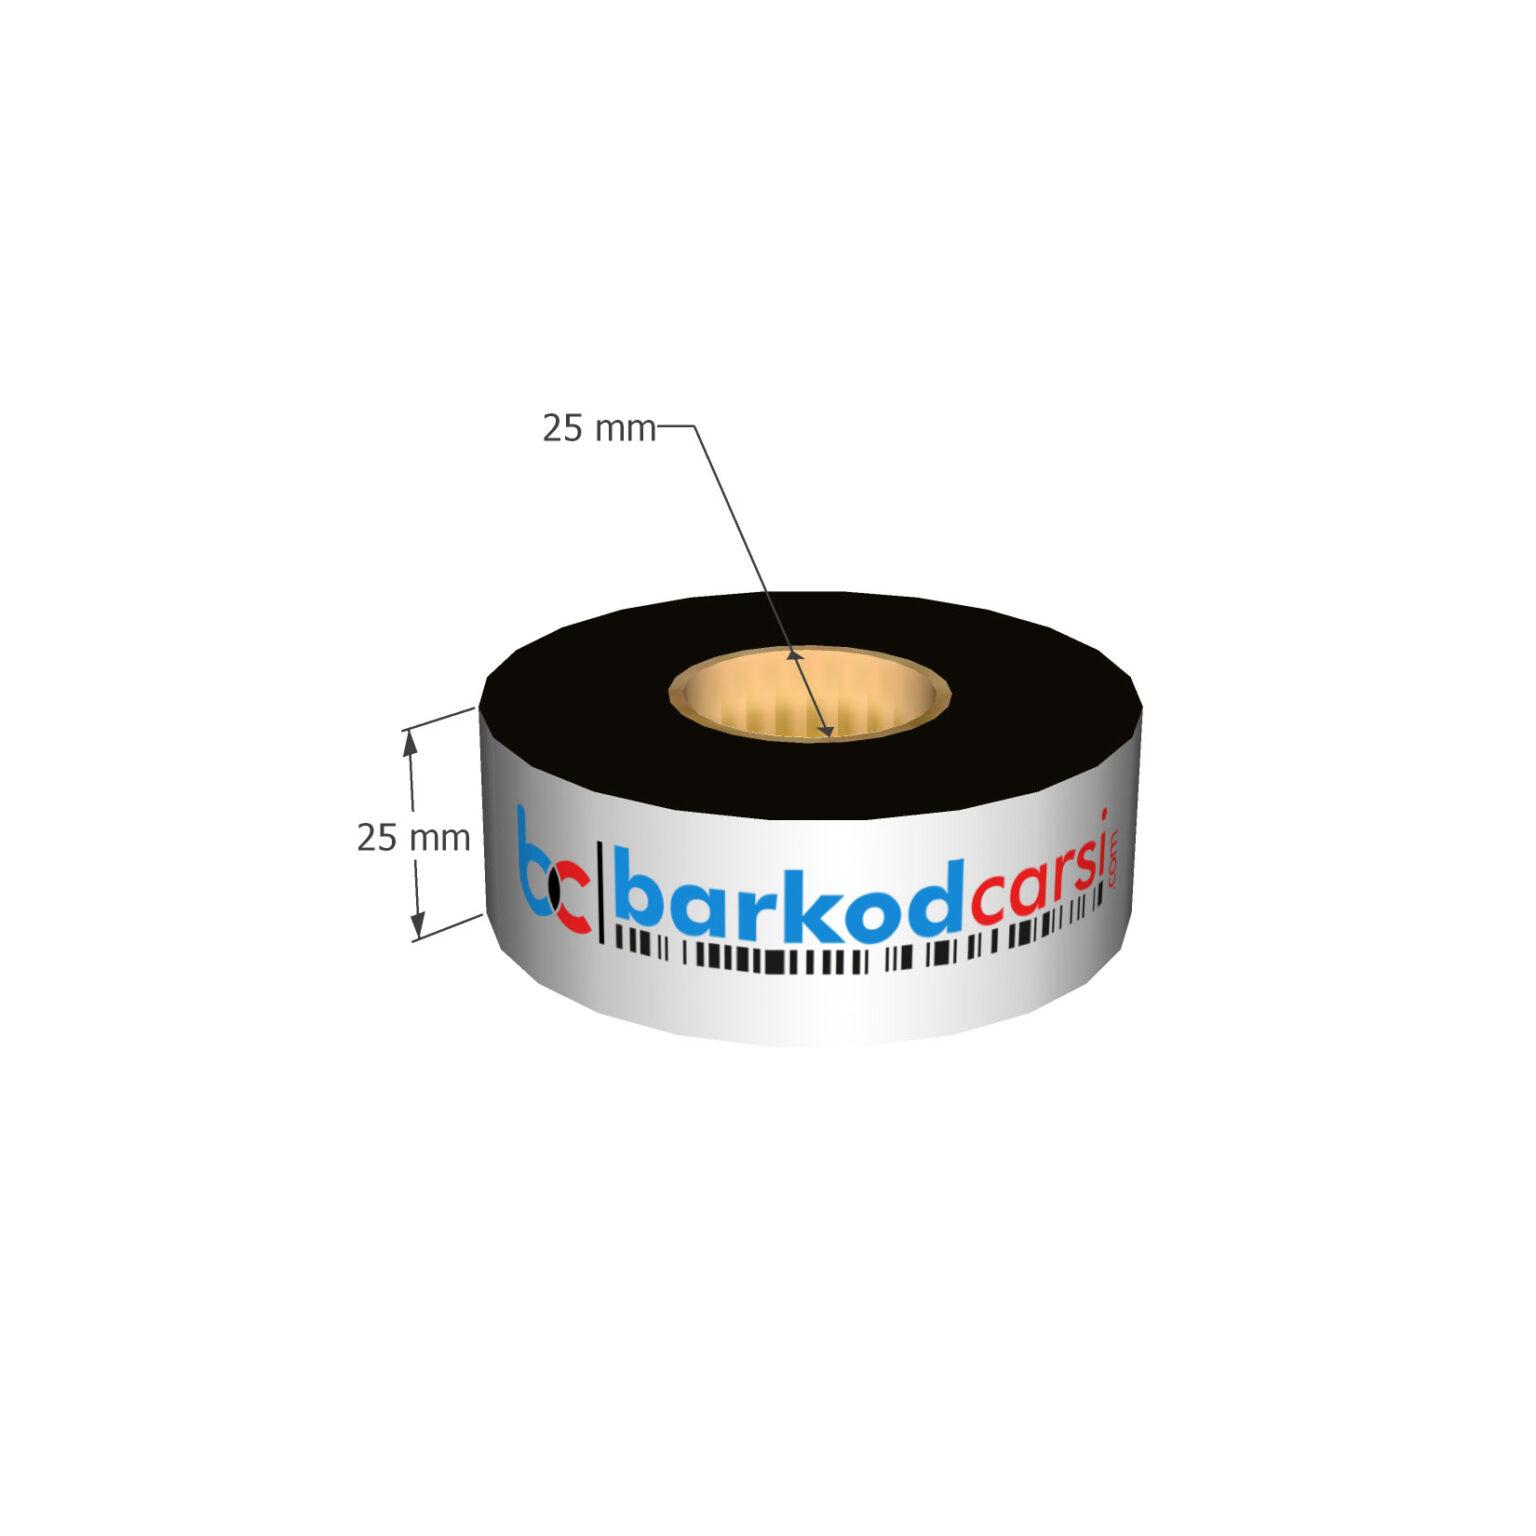 25x300 mt Wax / Wax-Resin / Resin / Hot-Foil Ribon Çeşitleri By BarkodCarsi.com